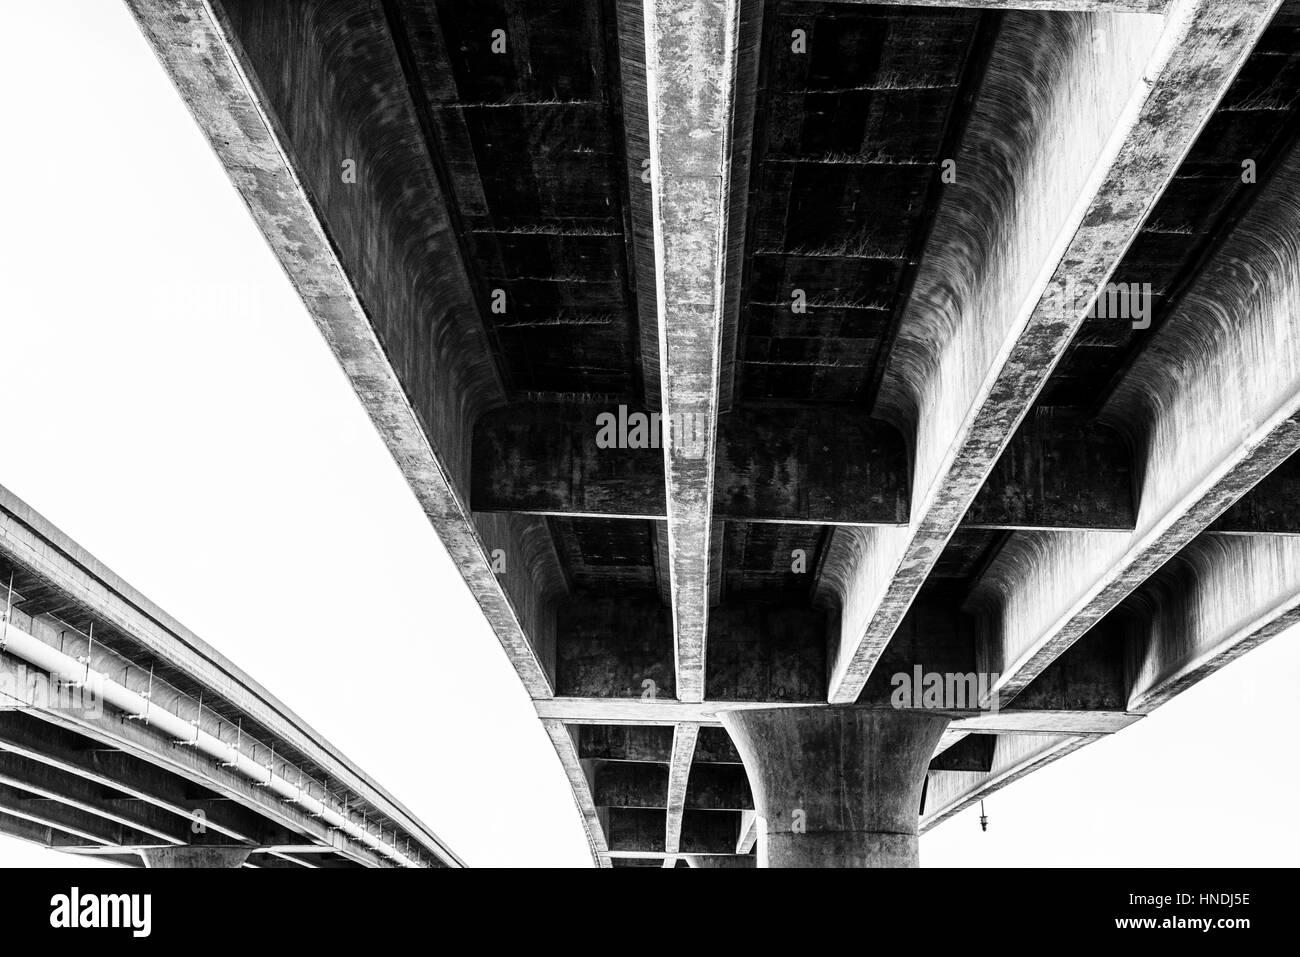 Ingraham Street Bridge, San Diego, Kalifornien, USA. Stockbild